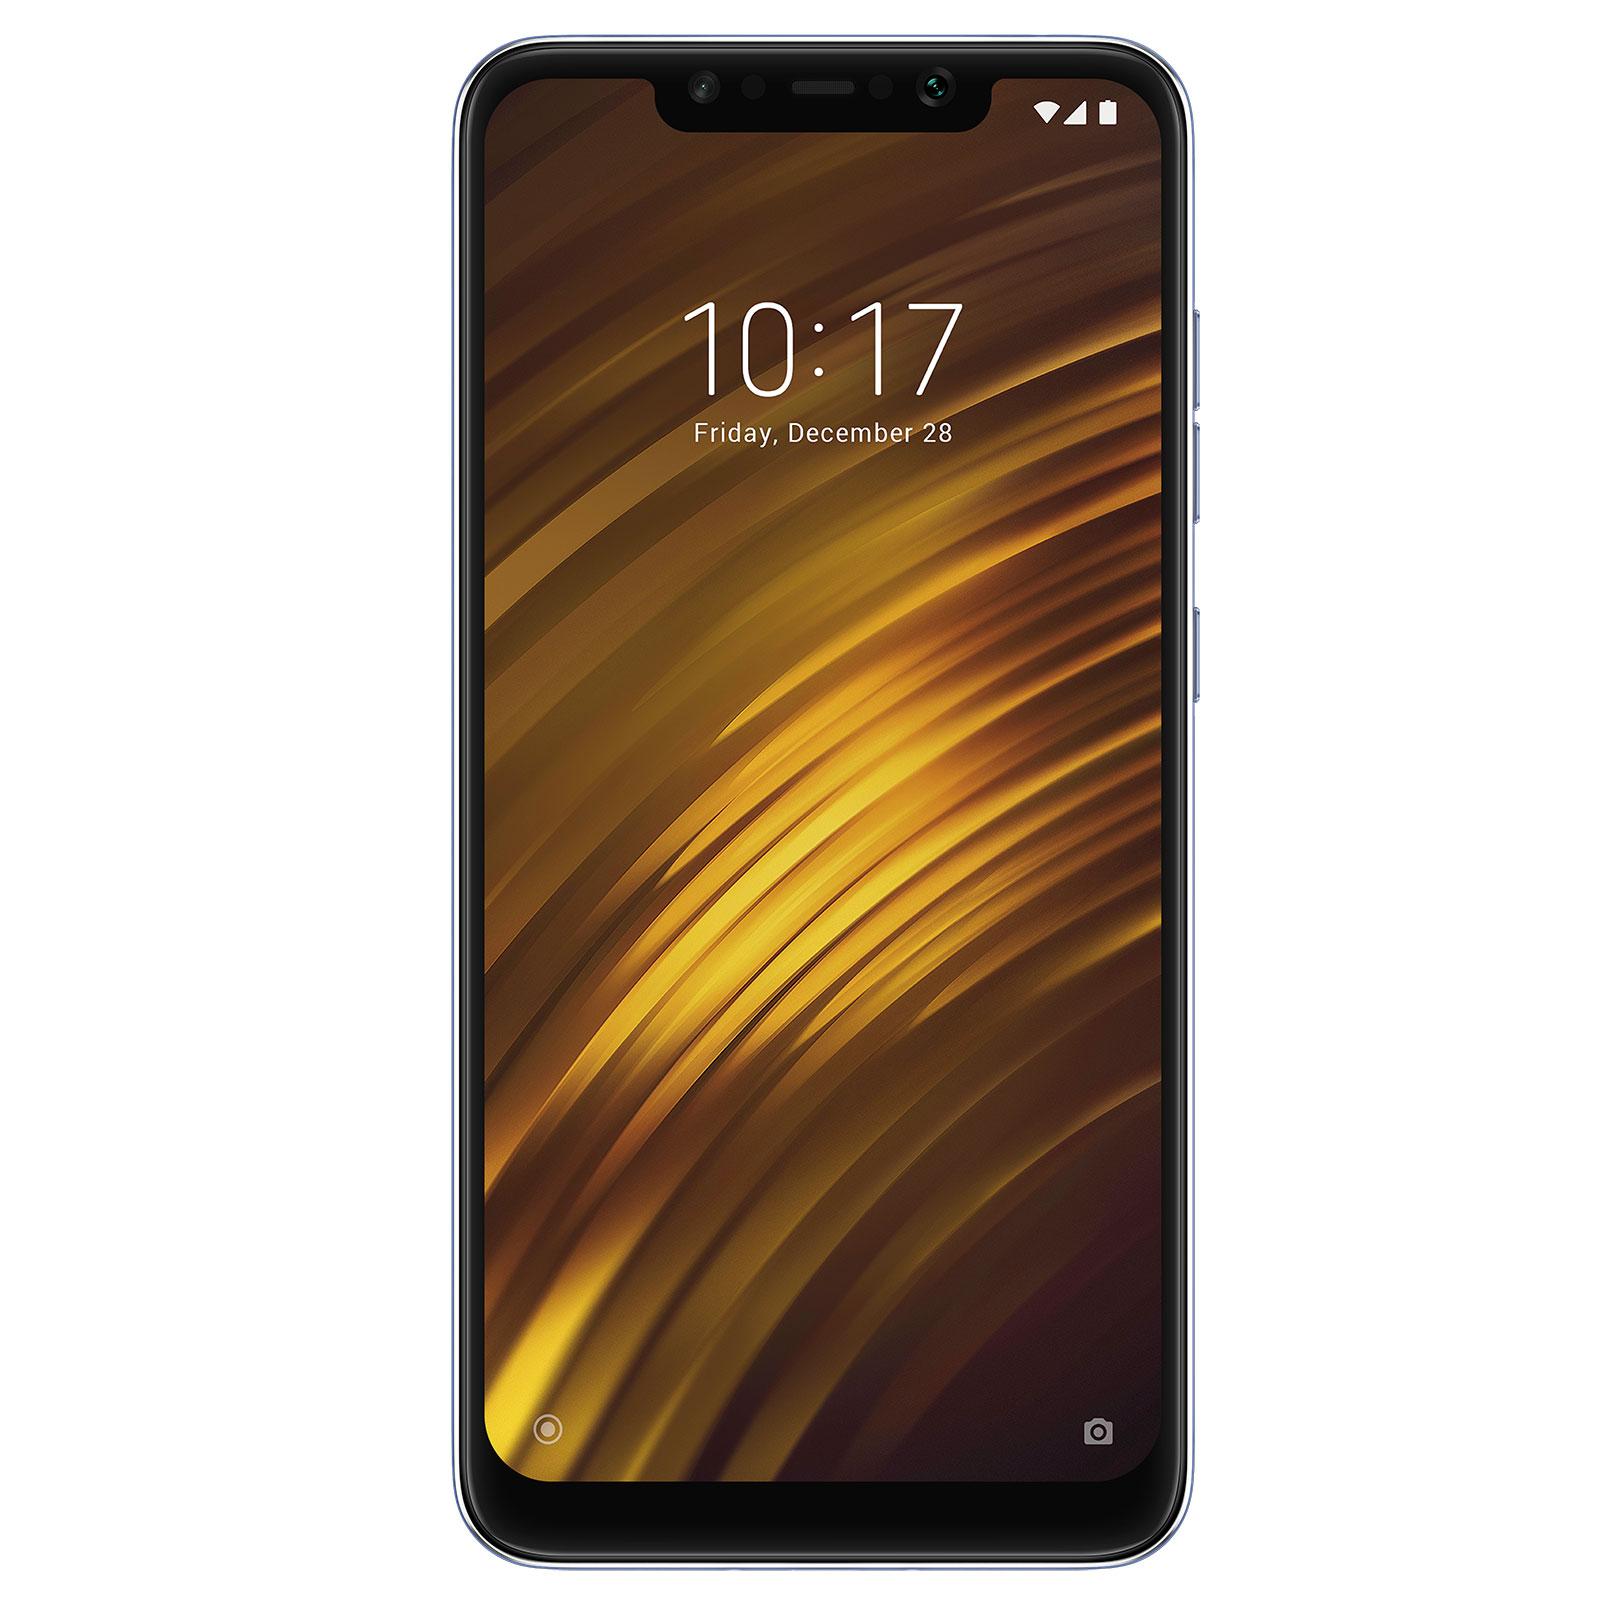 "Mobile & smartphone Xiaomi Pocophone F1 Bleu Acier (6 Go / 64 Go) Smartphone 4G-LTE Advanced Dual SIM - Snapdragon 845 Octo-Core 2.8 GHz - RAM 6 Go - Ecran tactile 6.18"" 1080 x 2246 - 64 Go - NFC/Bluetooth 5.0 - 4000 mAh - Android 8.1"